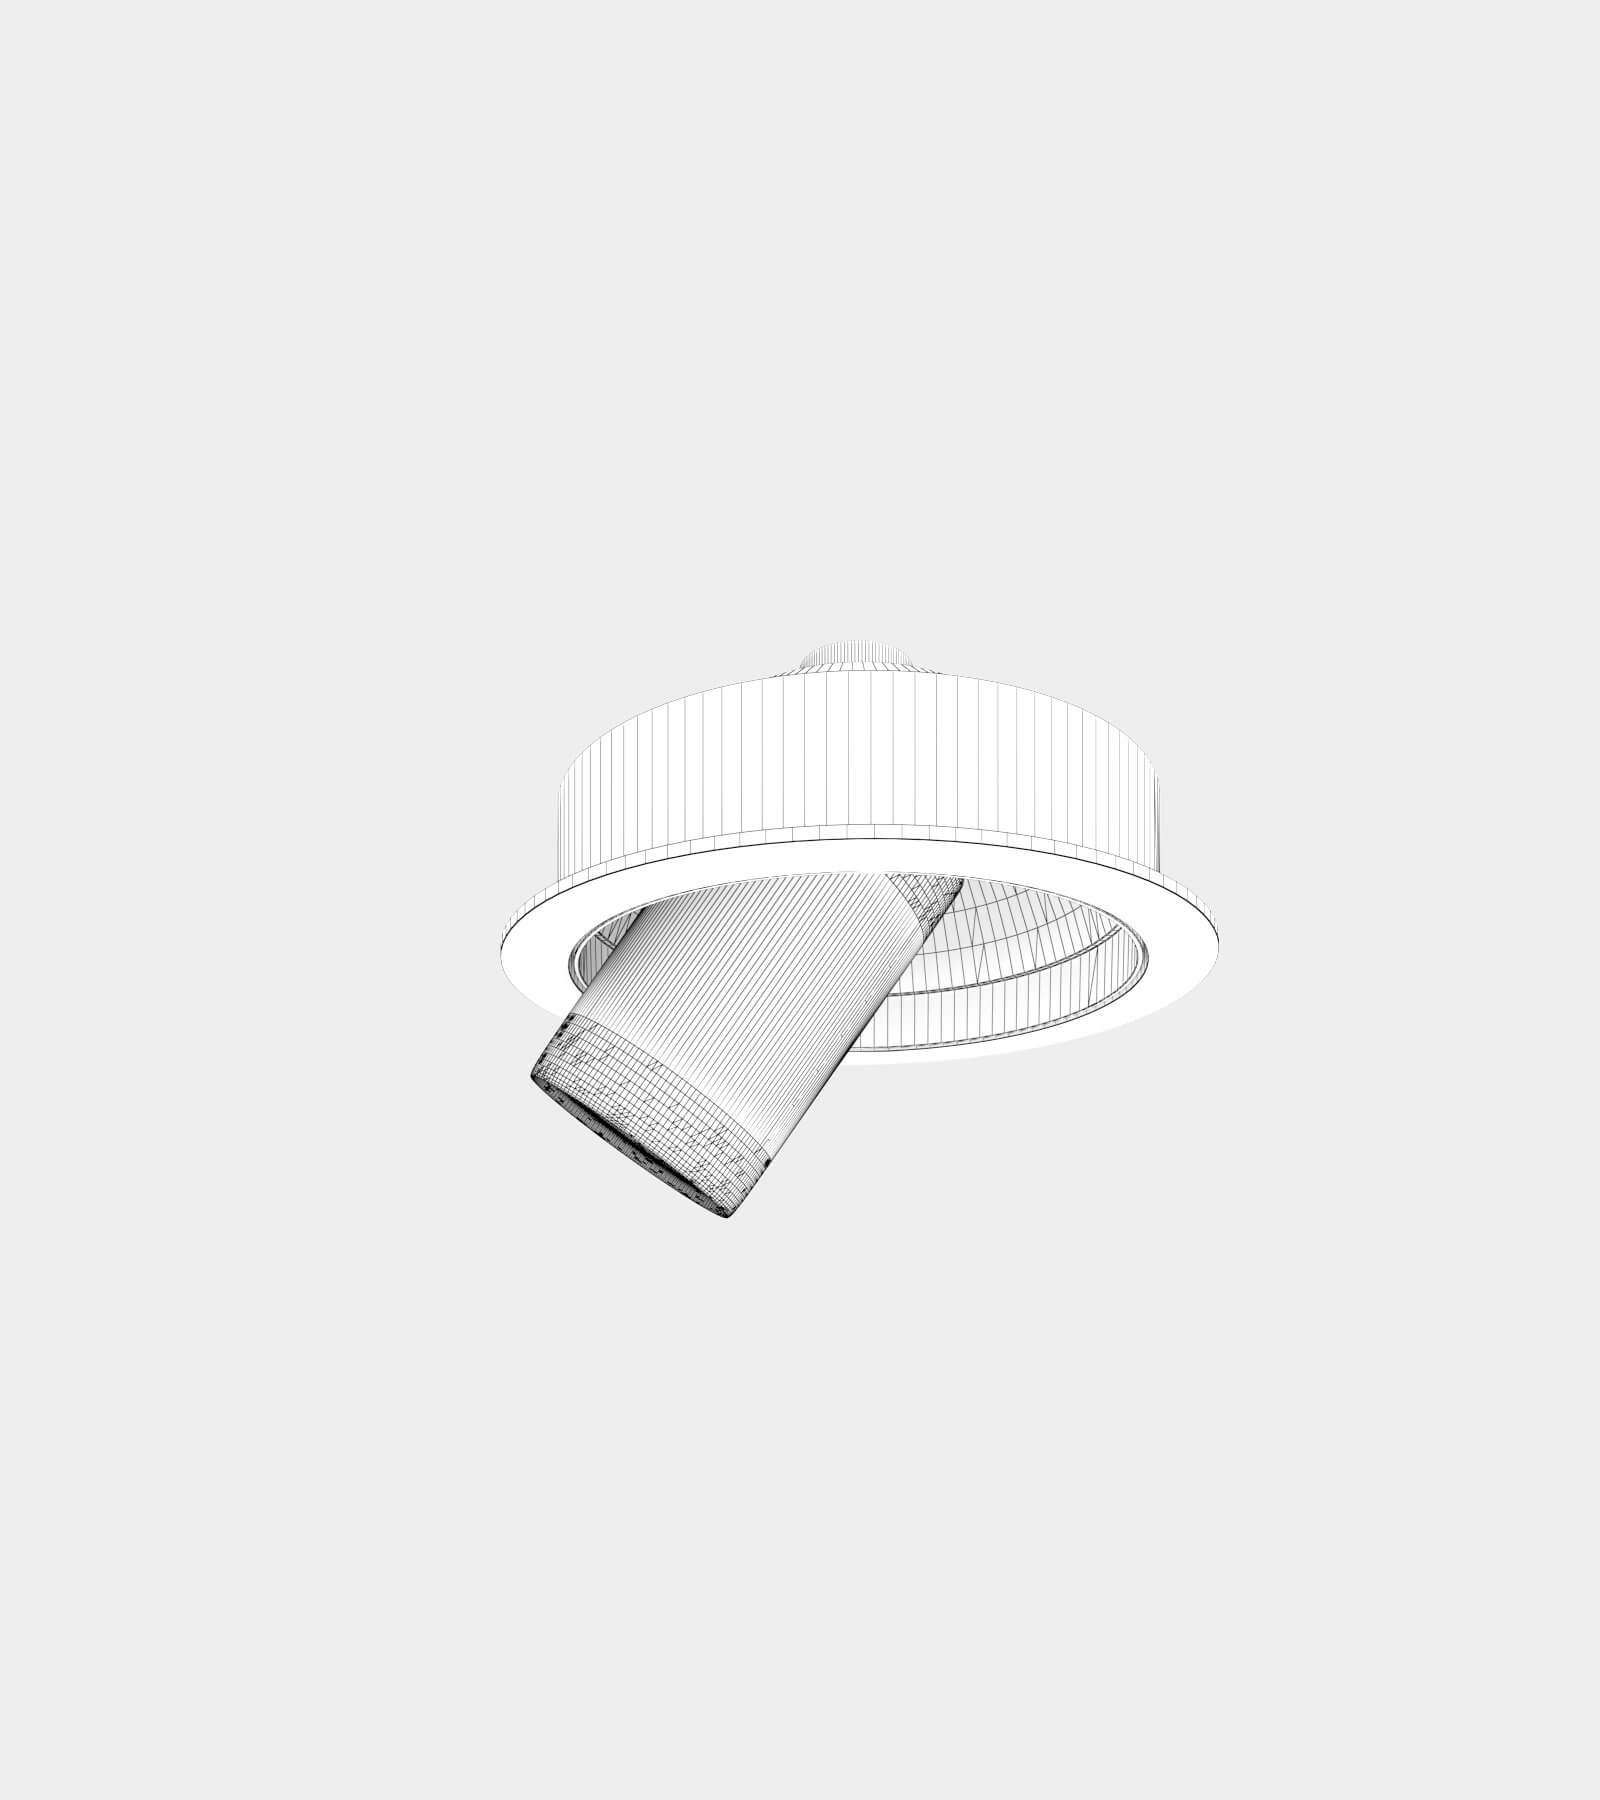 Adjustable recessed ceiling spotlights-wire-2 3D Model